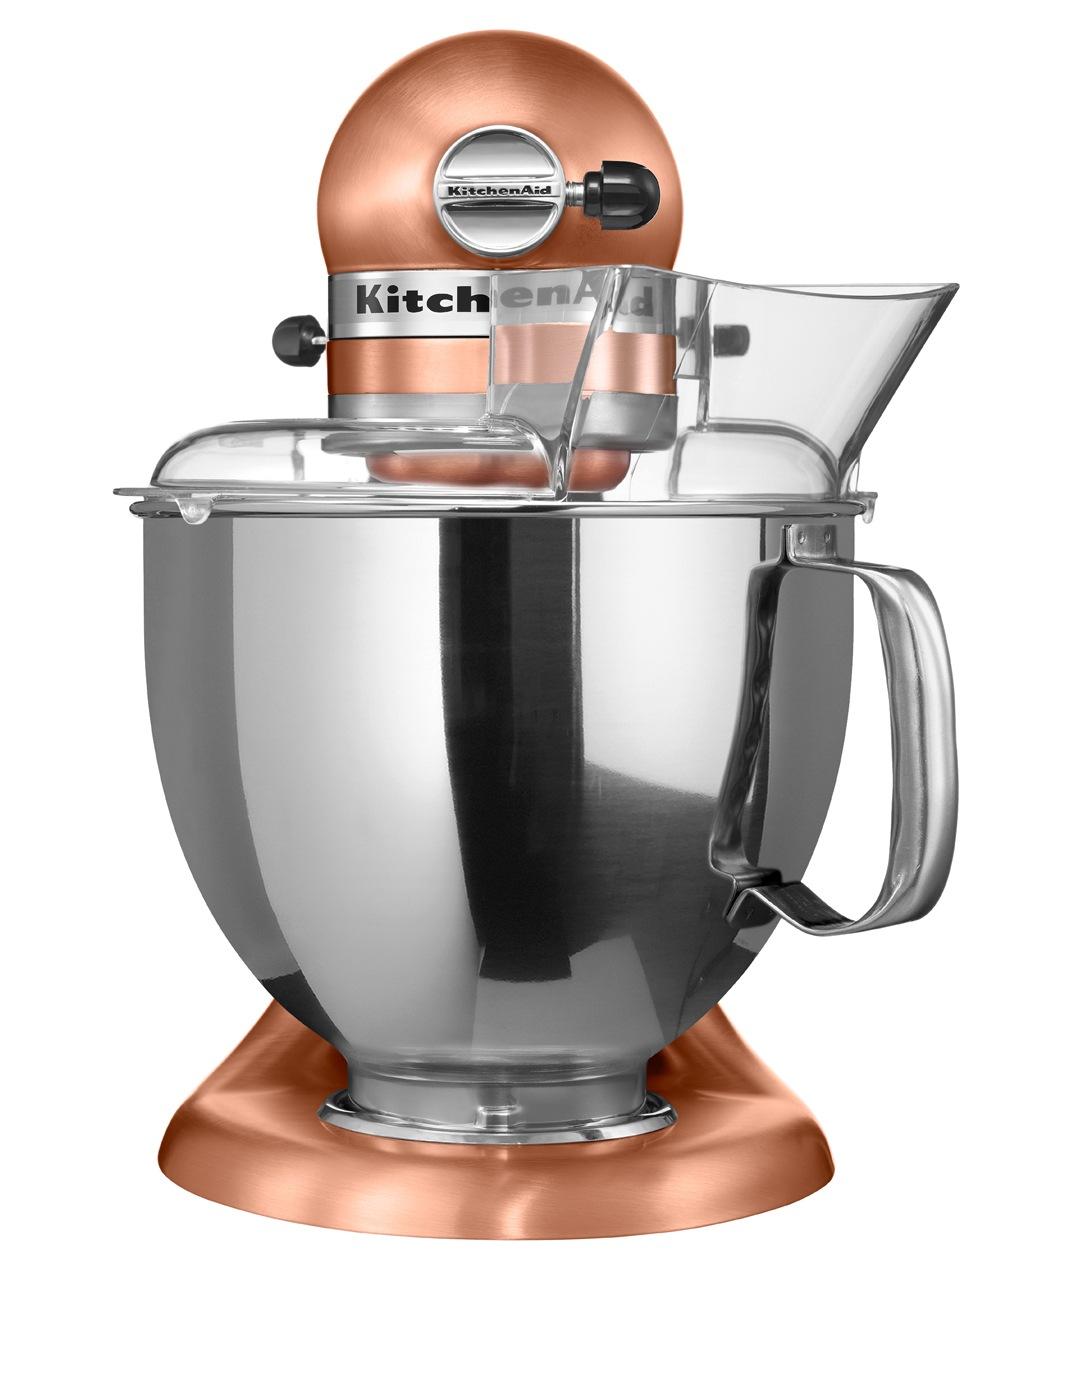 KitchenAid | KSM150 Artisan Stand Mixer - Satin Copper 5KSM150PSACP on copper disney, copper canisters at walmart, copper keurig, copper flatware,